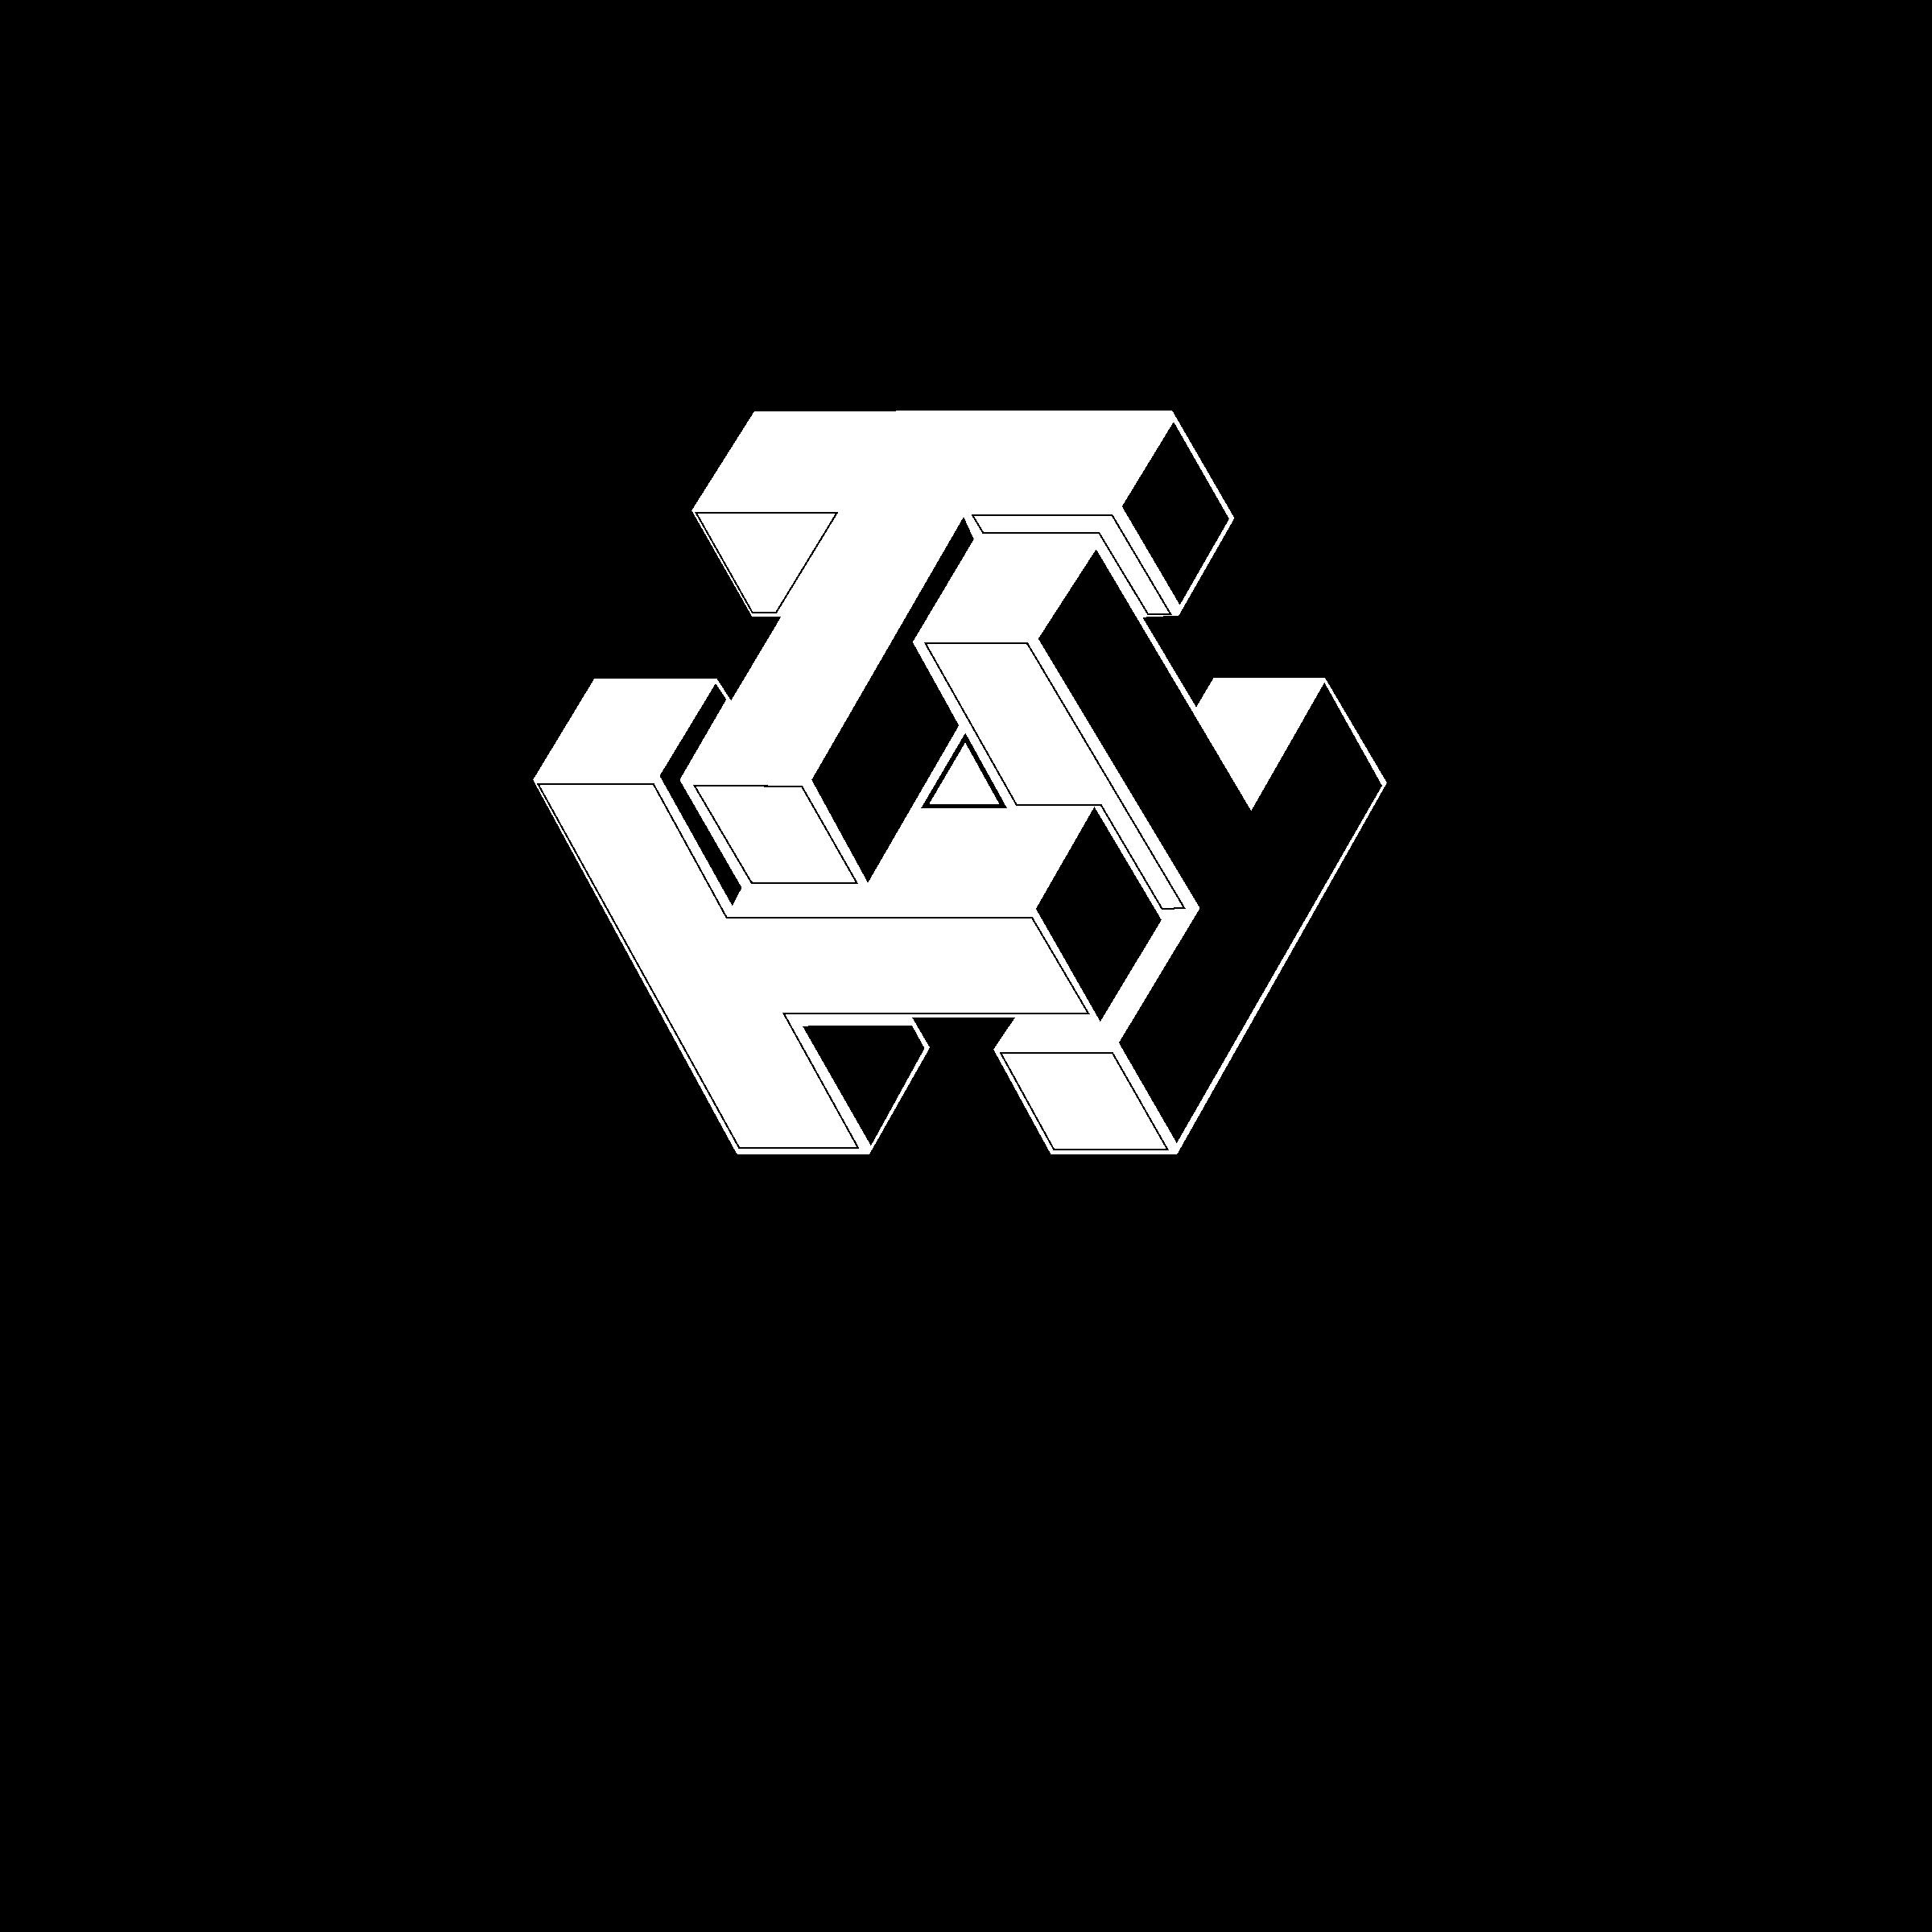 Terminator Logo PNG Transparent & SVG Vector.